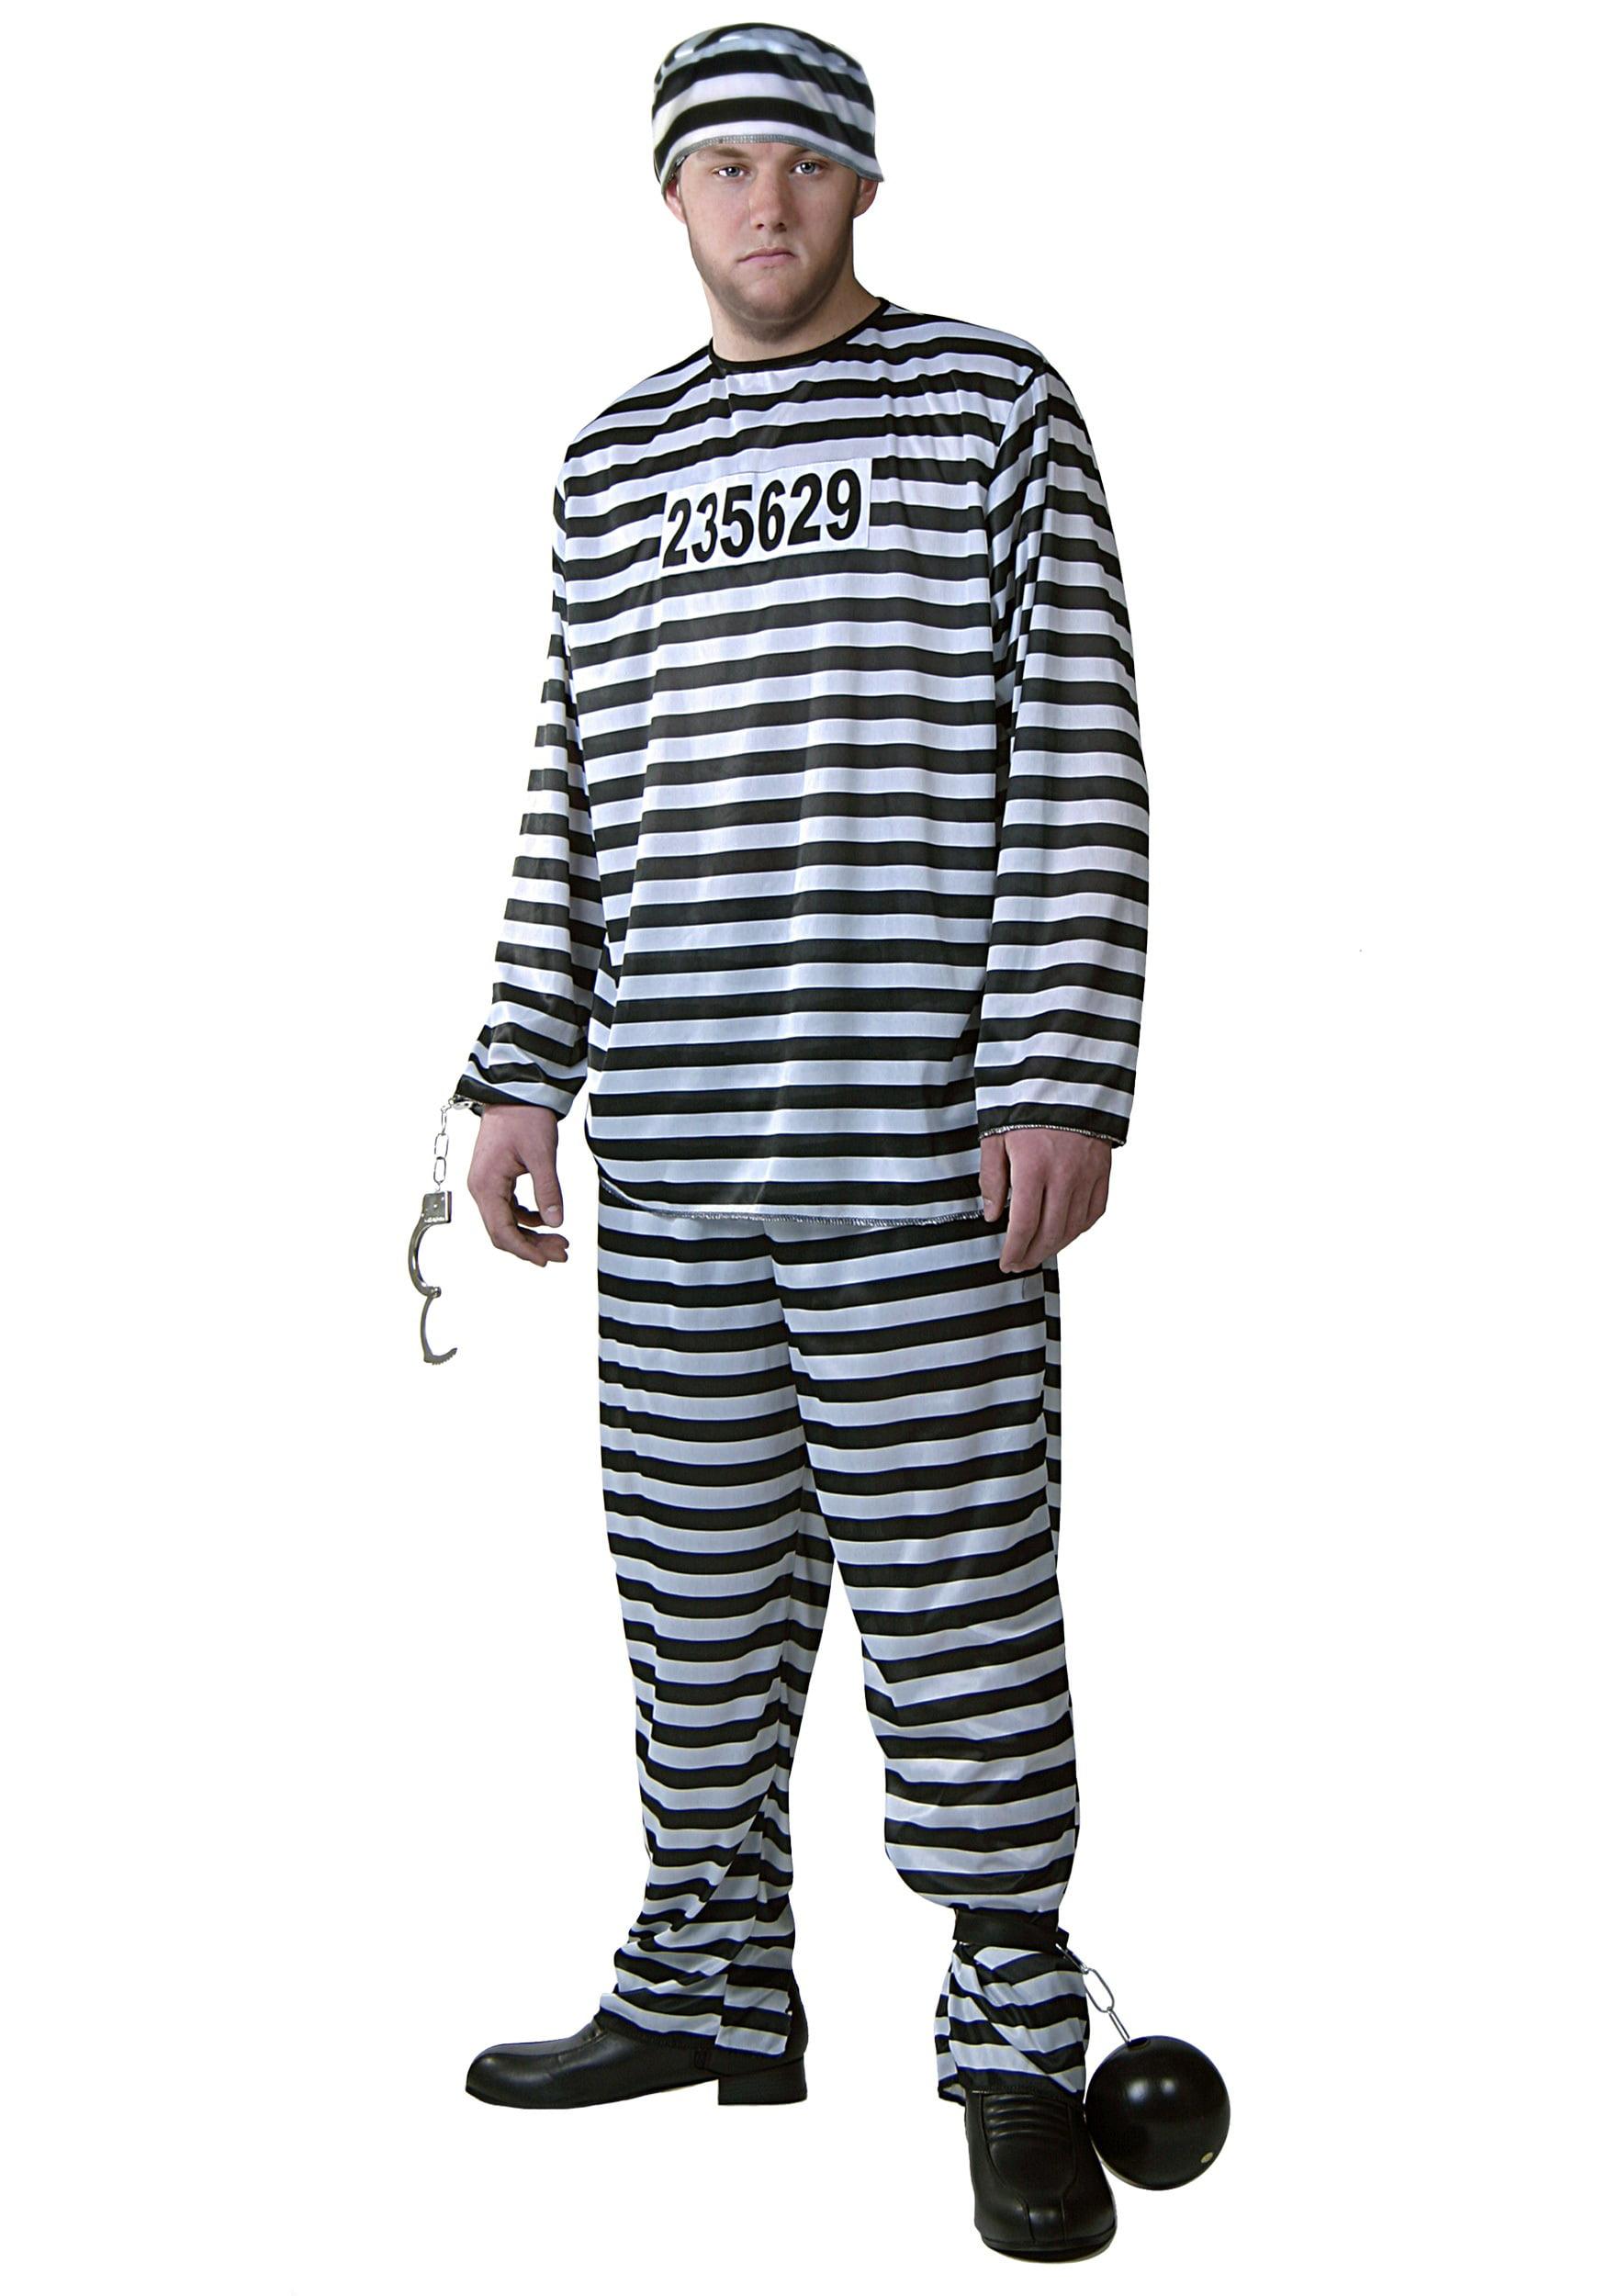 mens prisoner costume - prison jumpsuit costumes - walmart